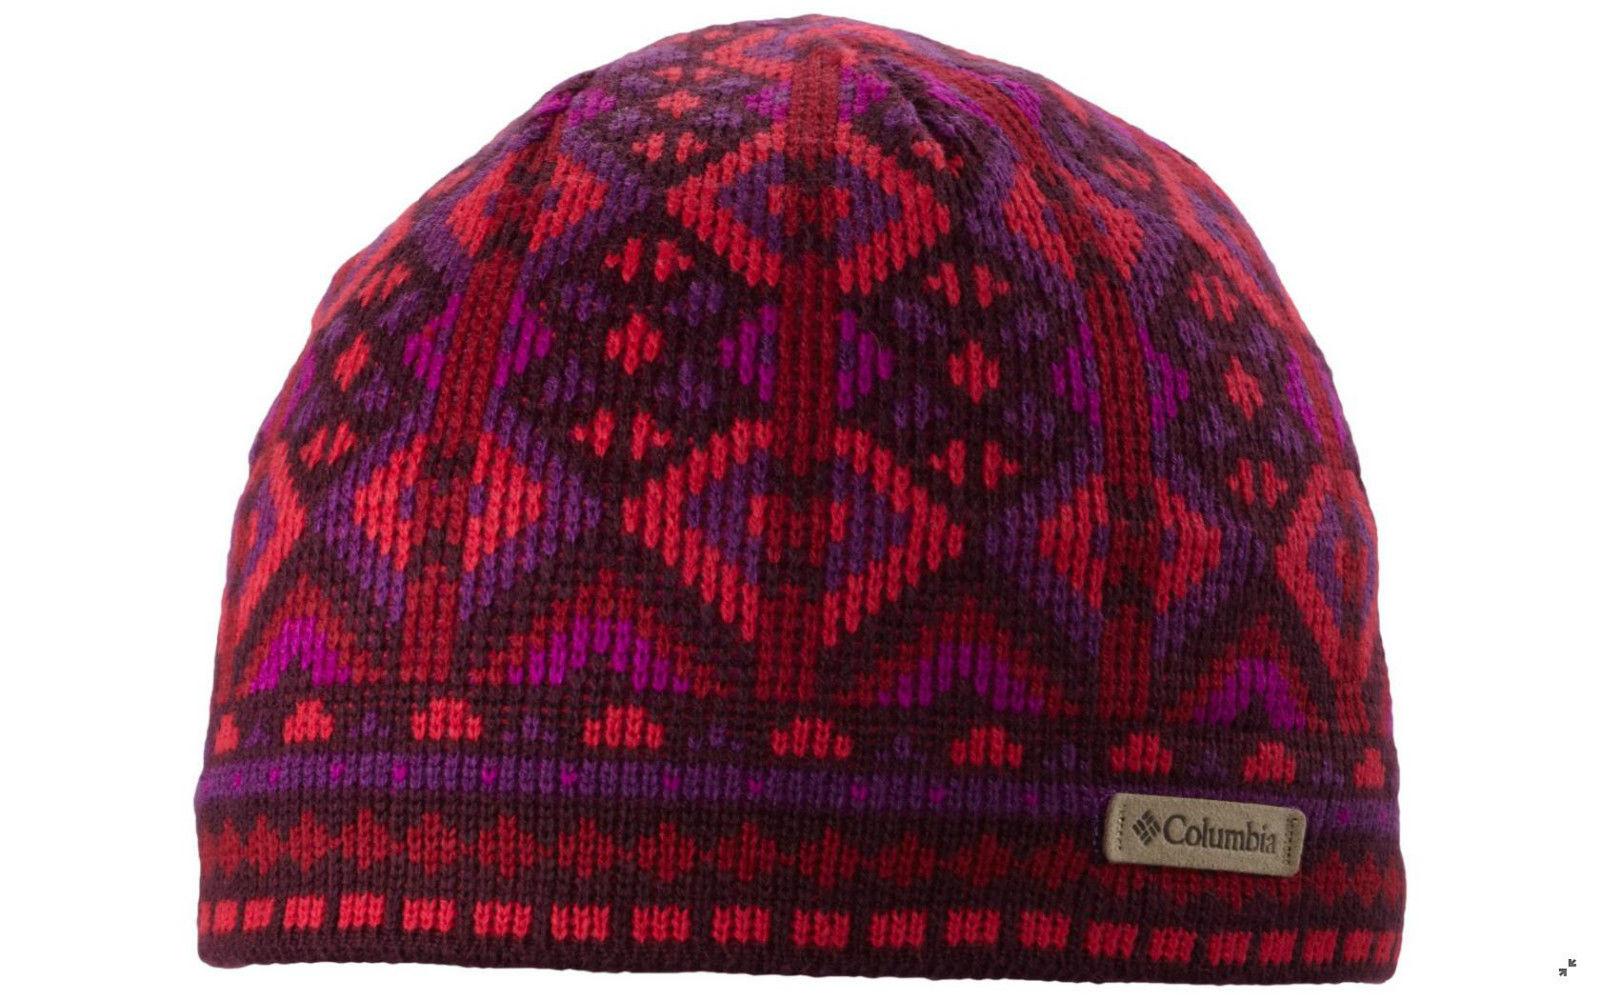 Columbia Alpine Action Beanie Unisex Omni-Heat Winter hat